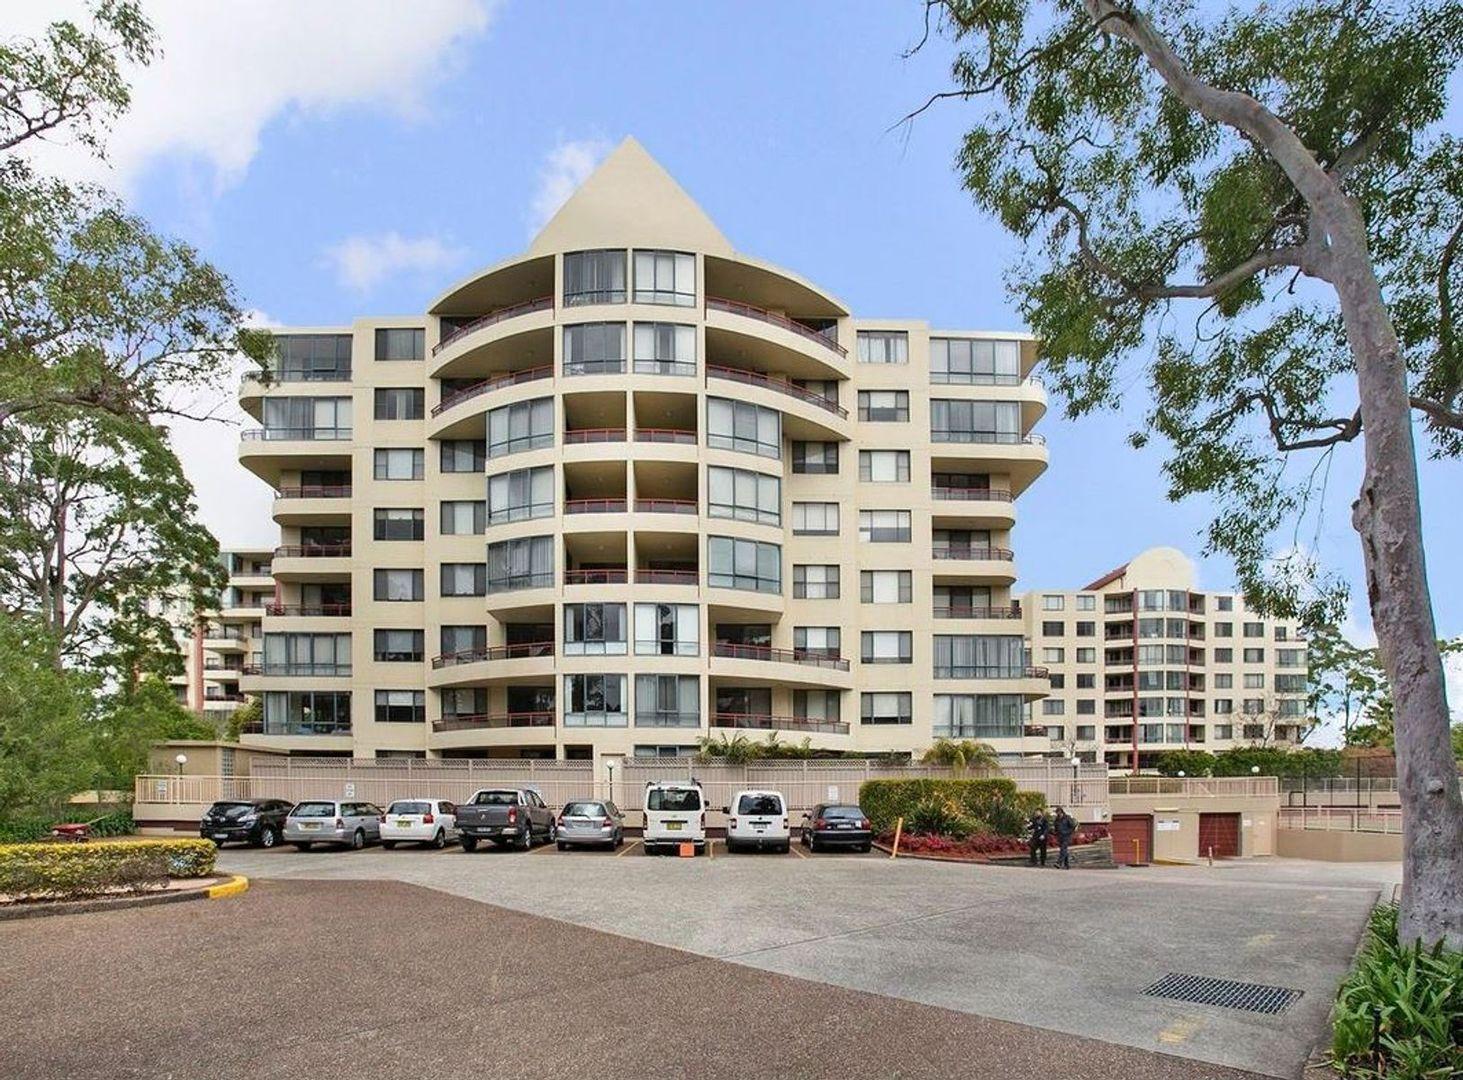 154/1-15 Fontenoy Road, Macquarie Park NSW 2113, Image 0